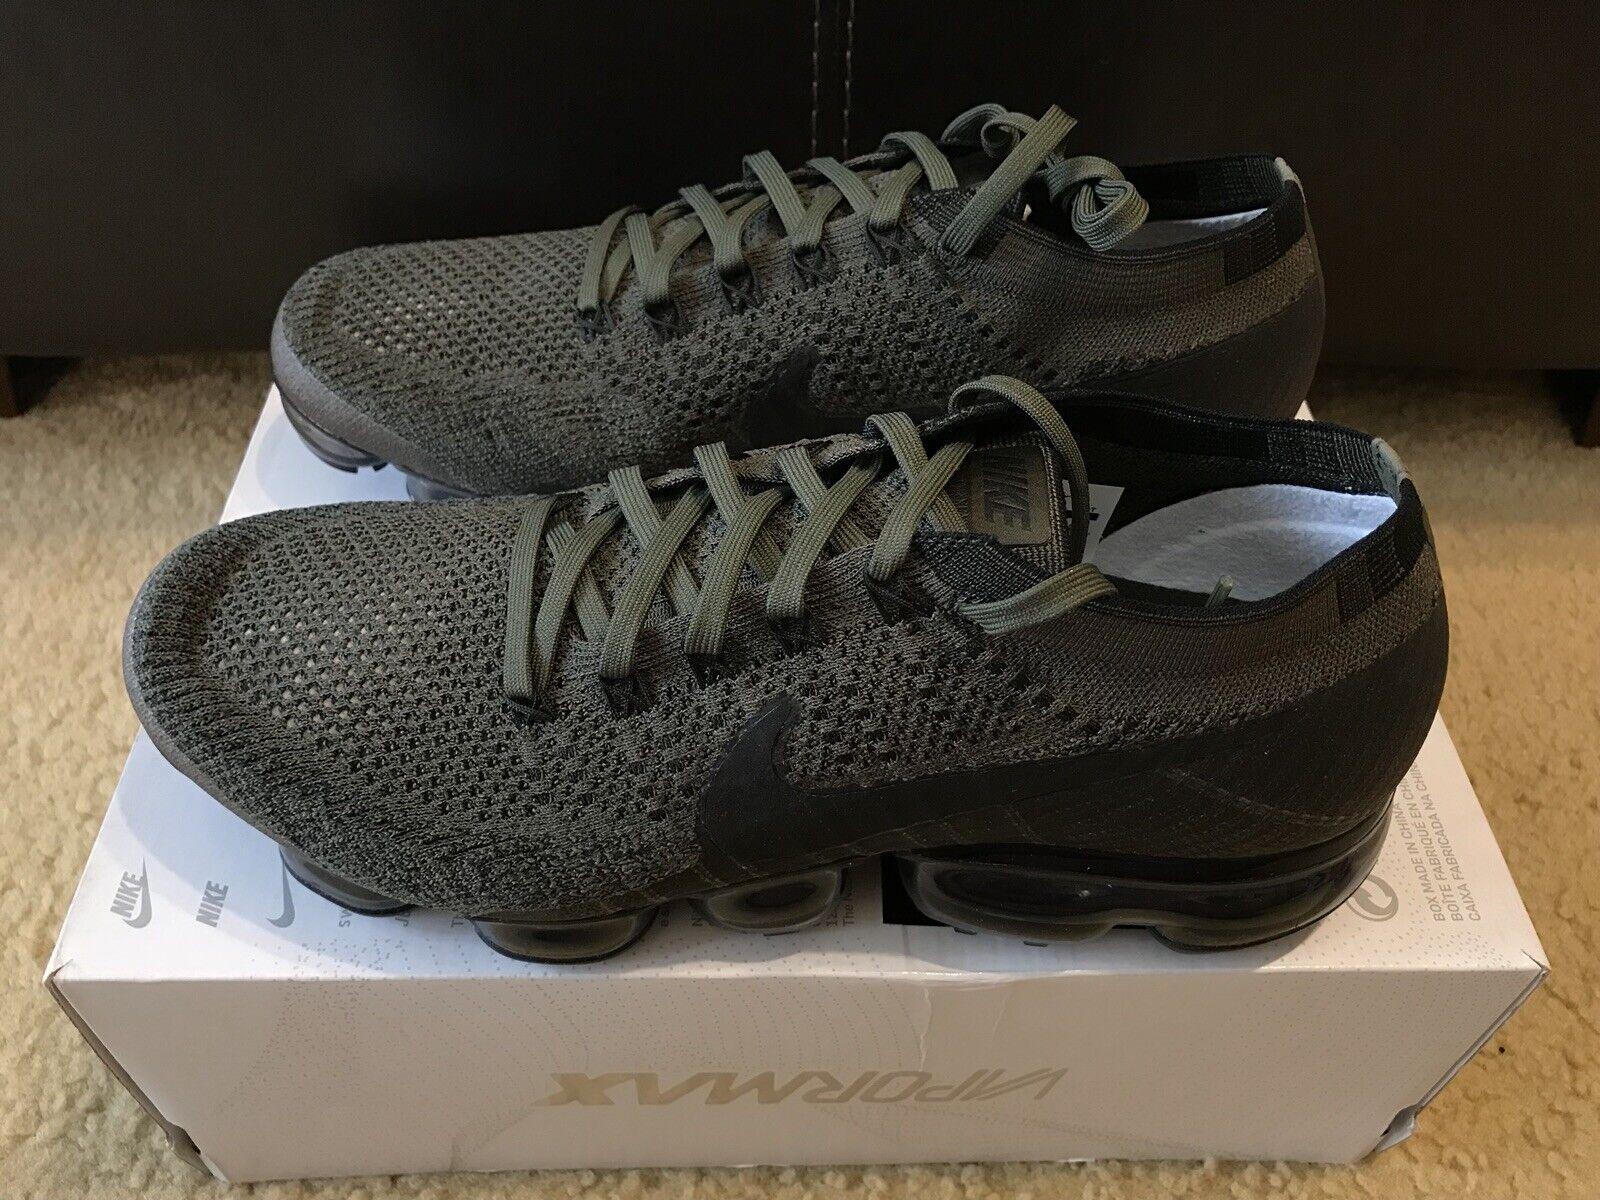 Nike Air Vapormax Flyknit Men's Men's Men's 10.5 Cargo Khaki Black Medium Olive 849558 300 8f0aca